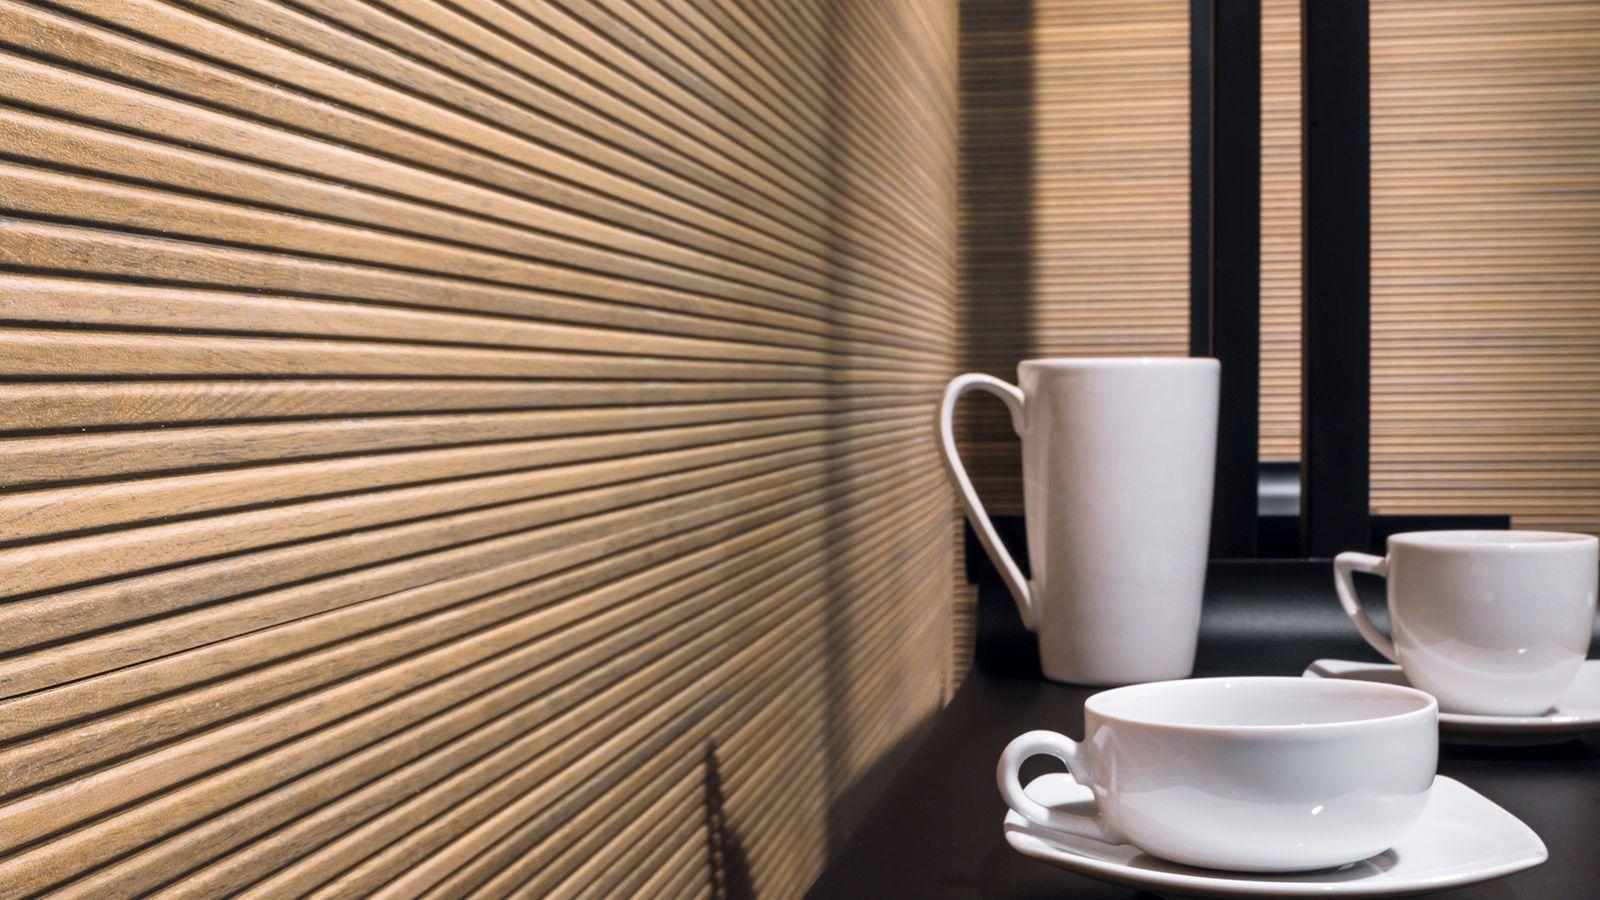 Starwood Wall Tiles Ice Nebraska Coffee 45×120 Cm Havana New  # Muebles Cieli Aperti